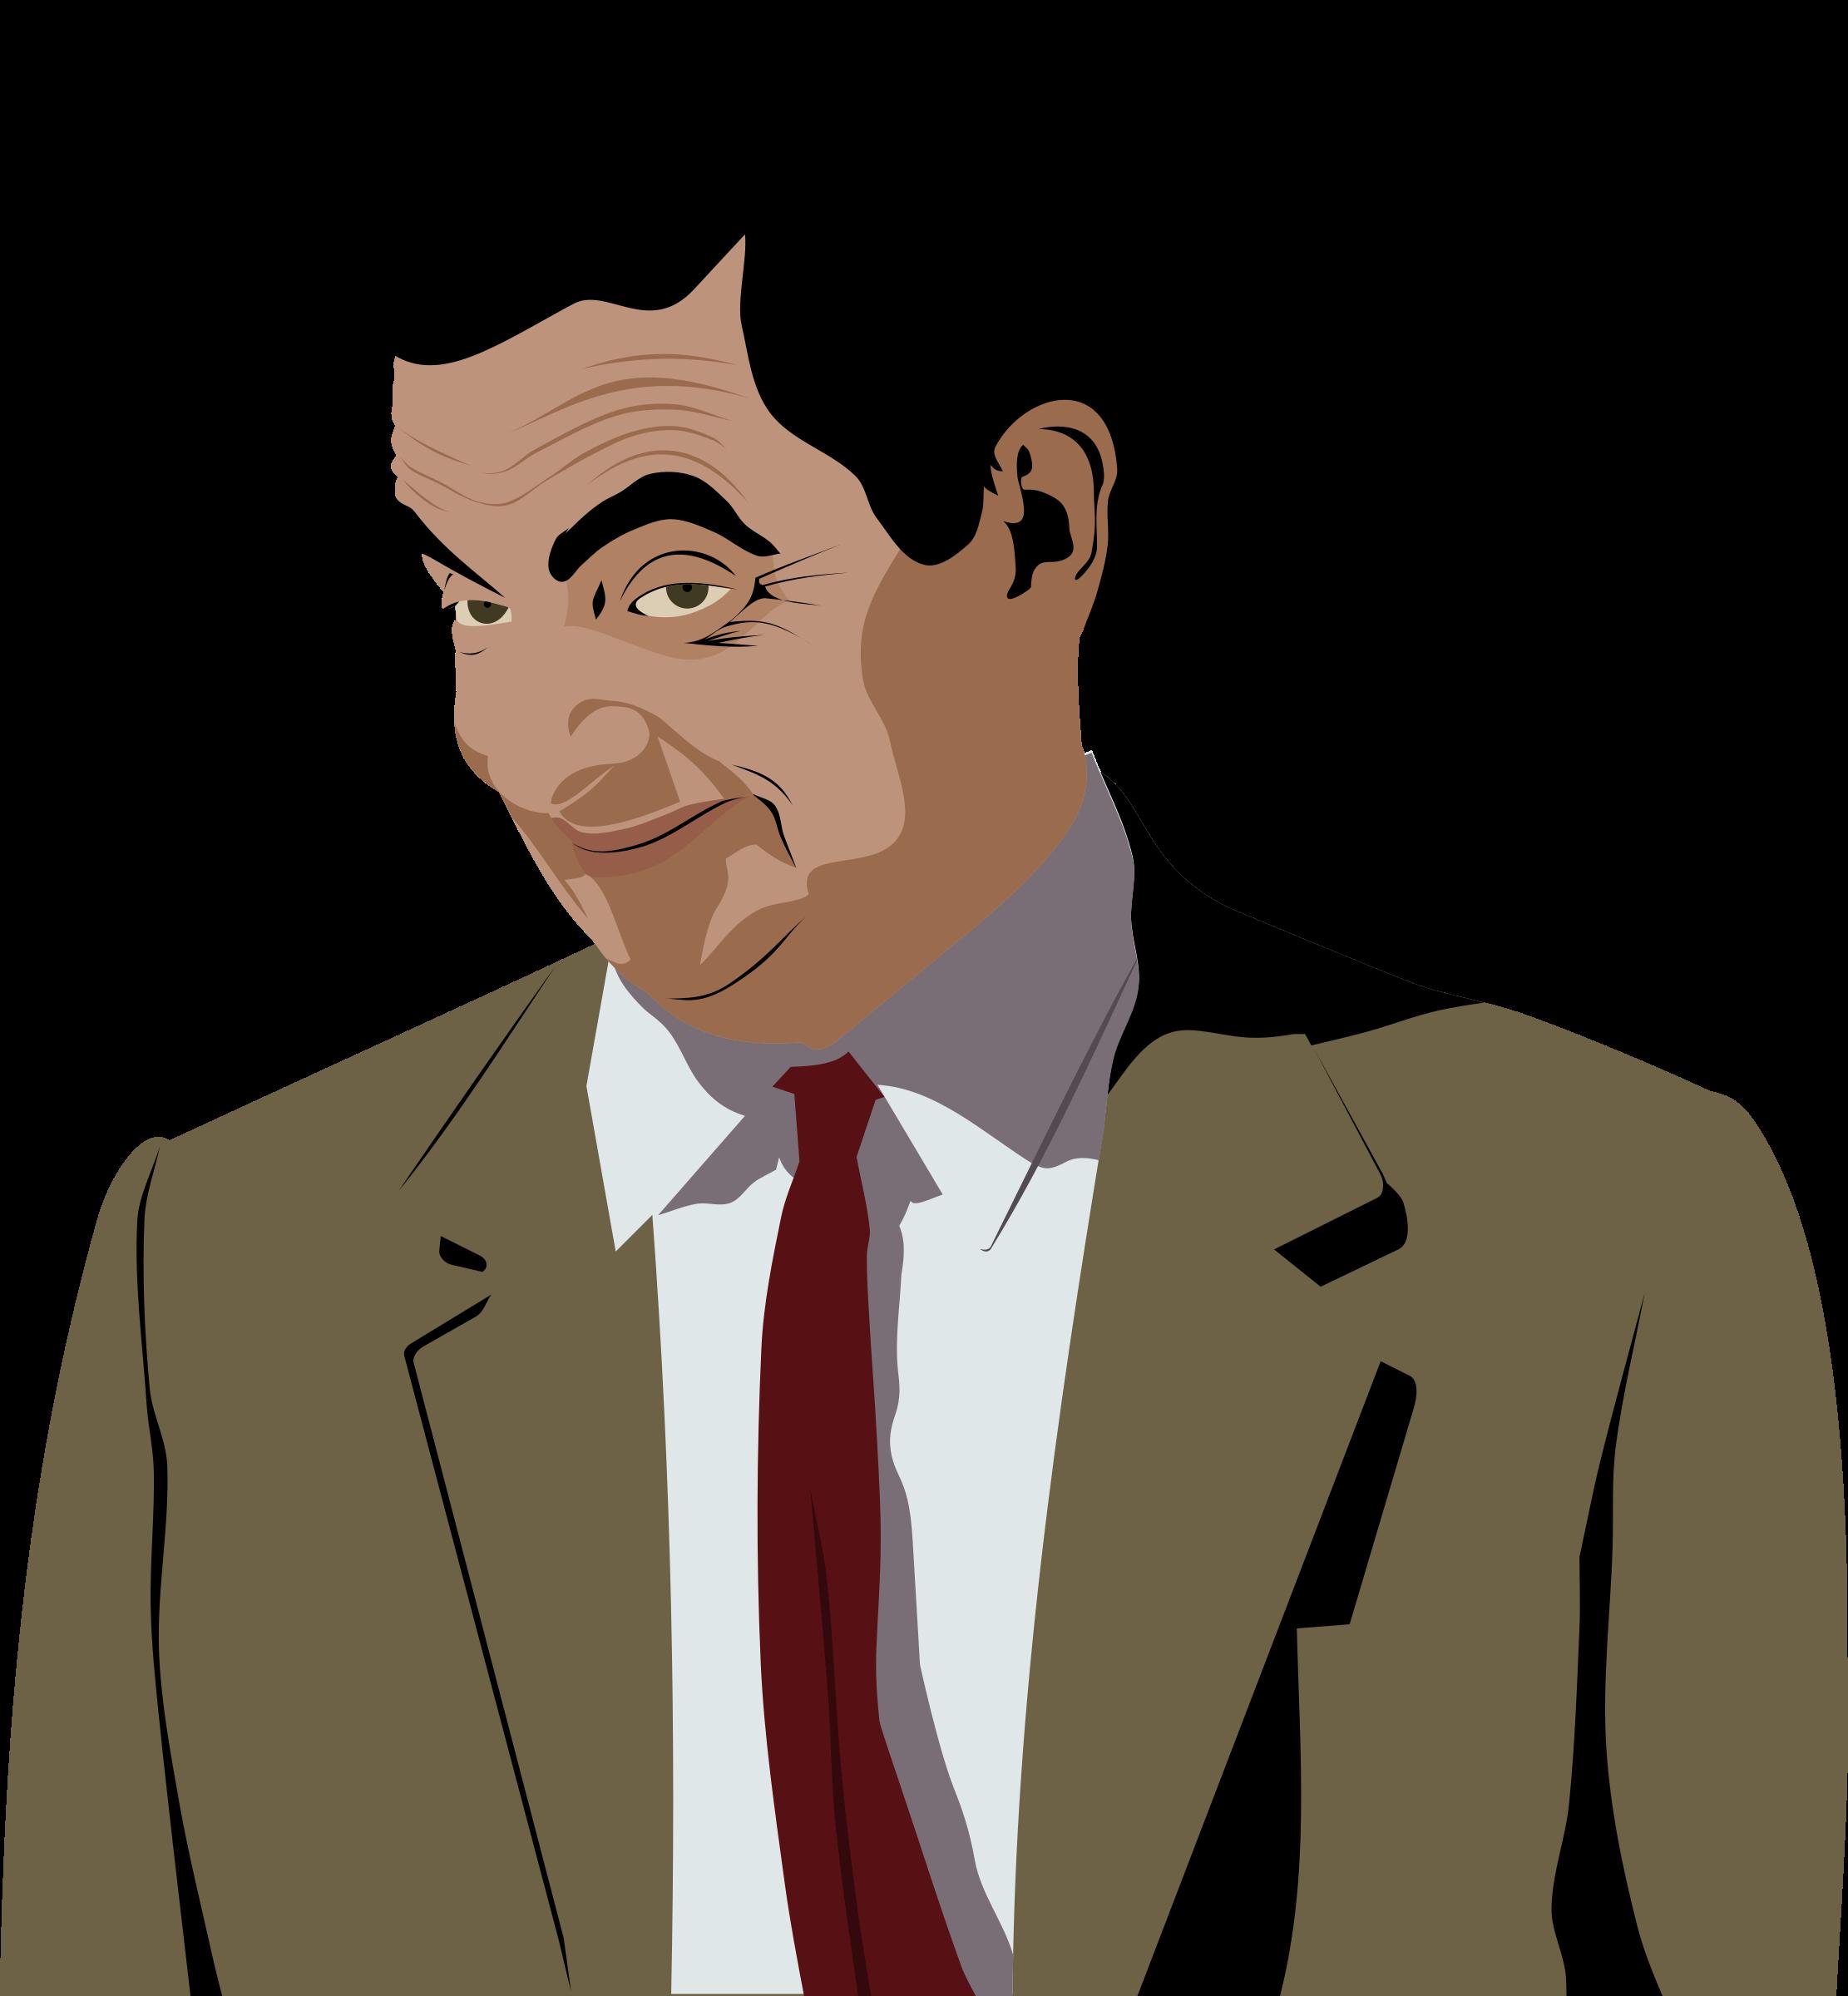 Rowan Atkinson Png Image British Sitcoms Comedians Comic Actor